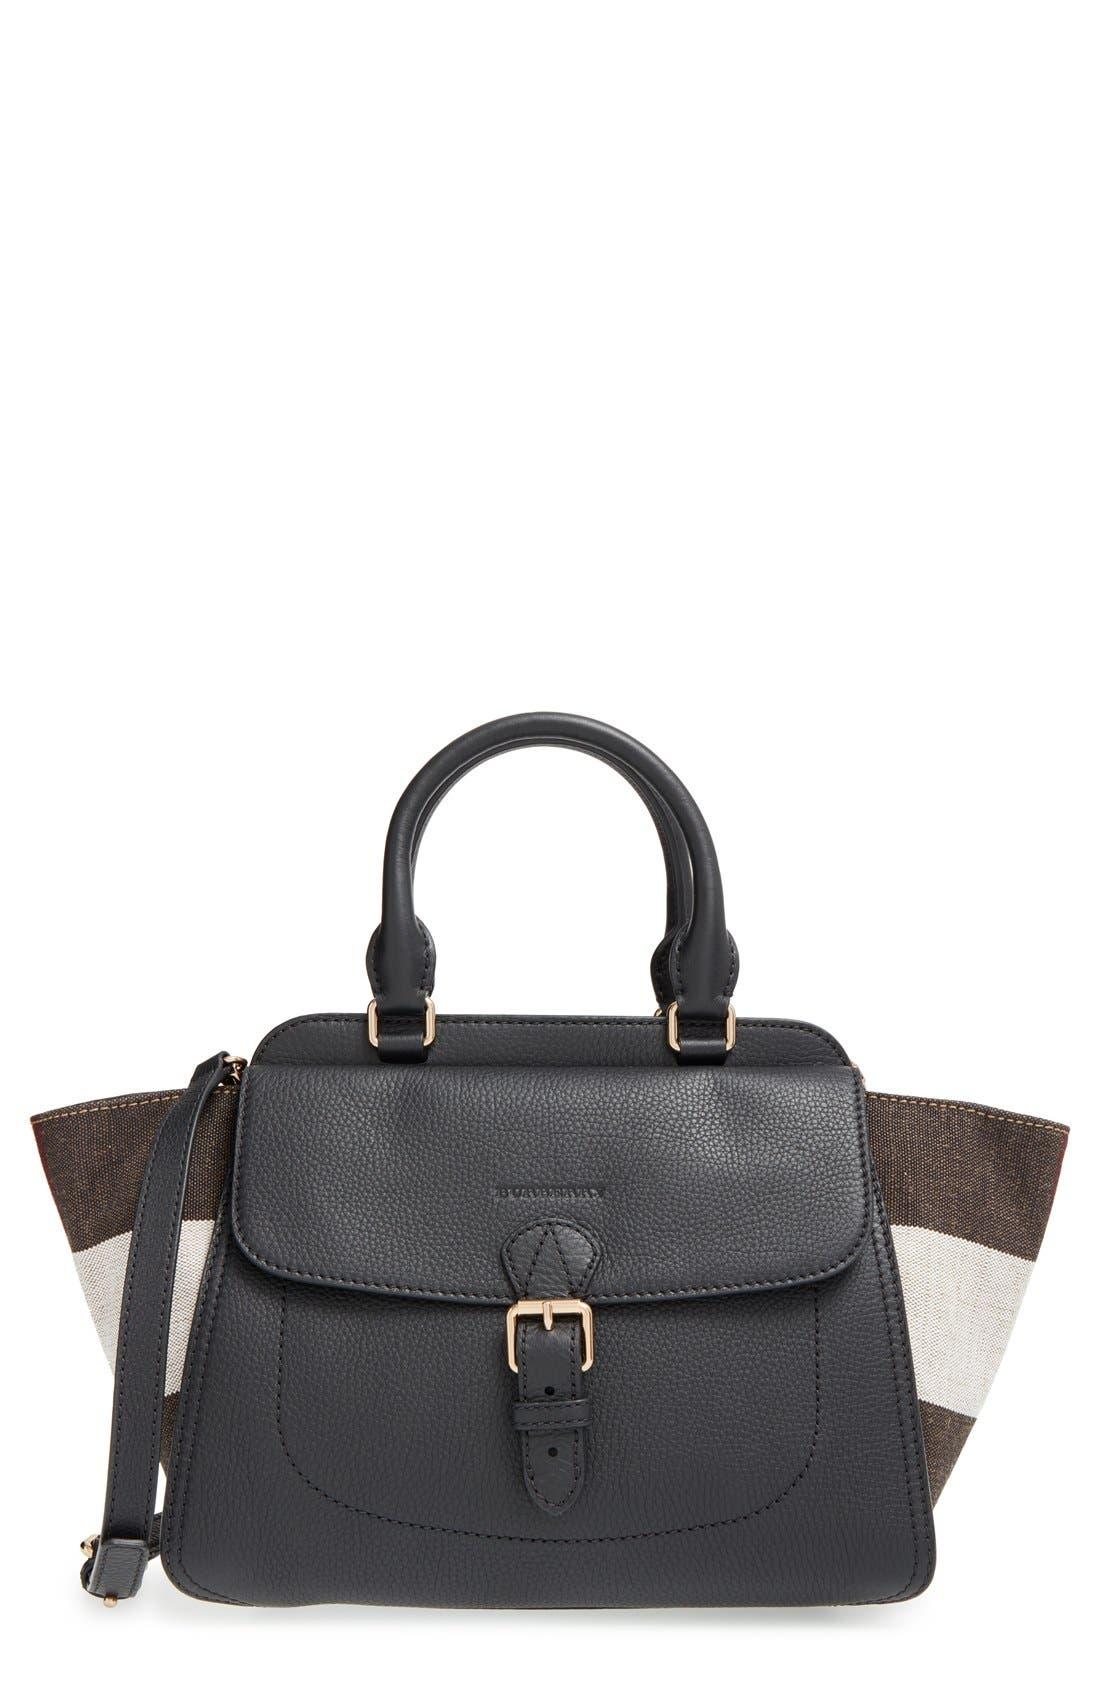 BURBERRY, 'Medium Harcourt' Check & Pebbled Leather Satchel, Main thumbnail 1, color, 001